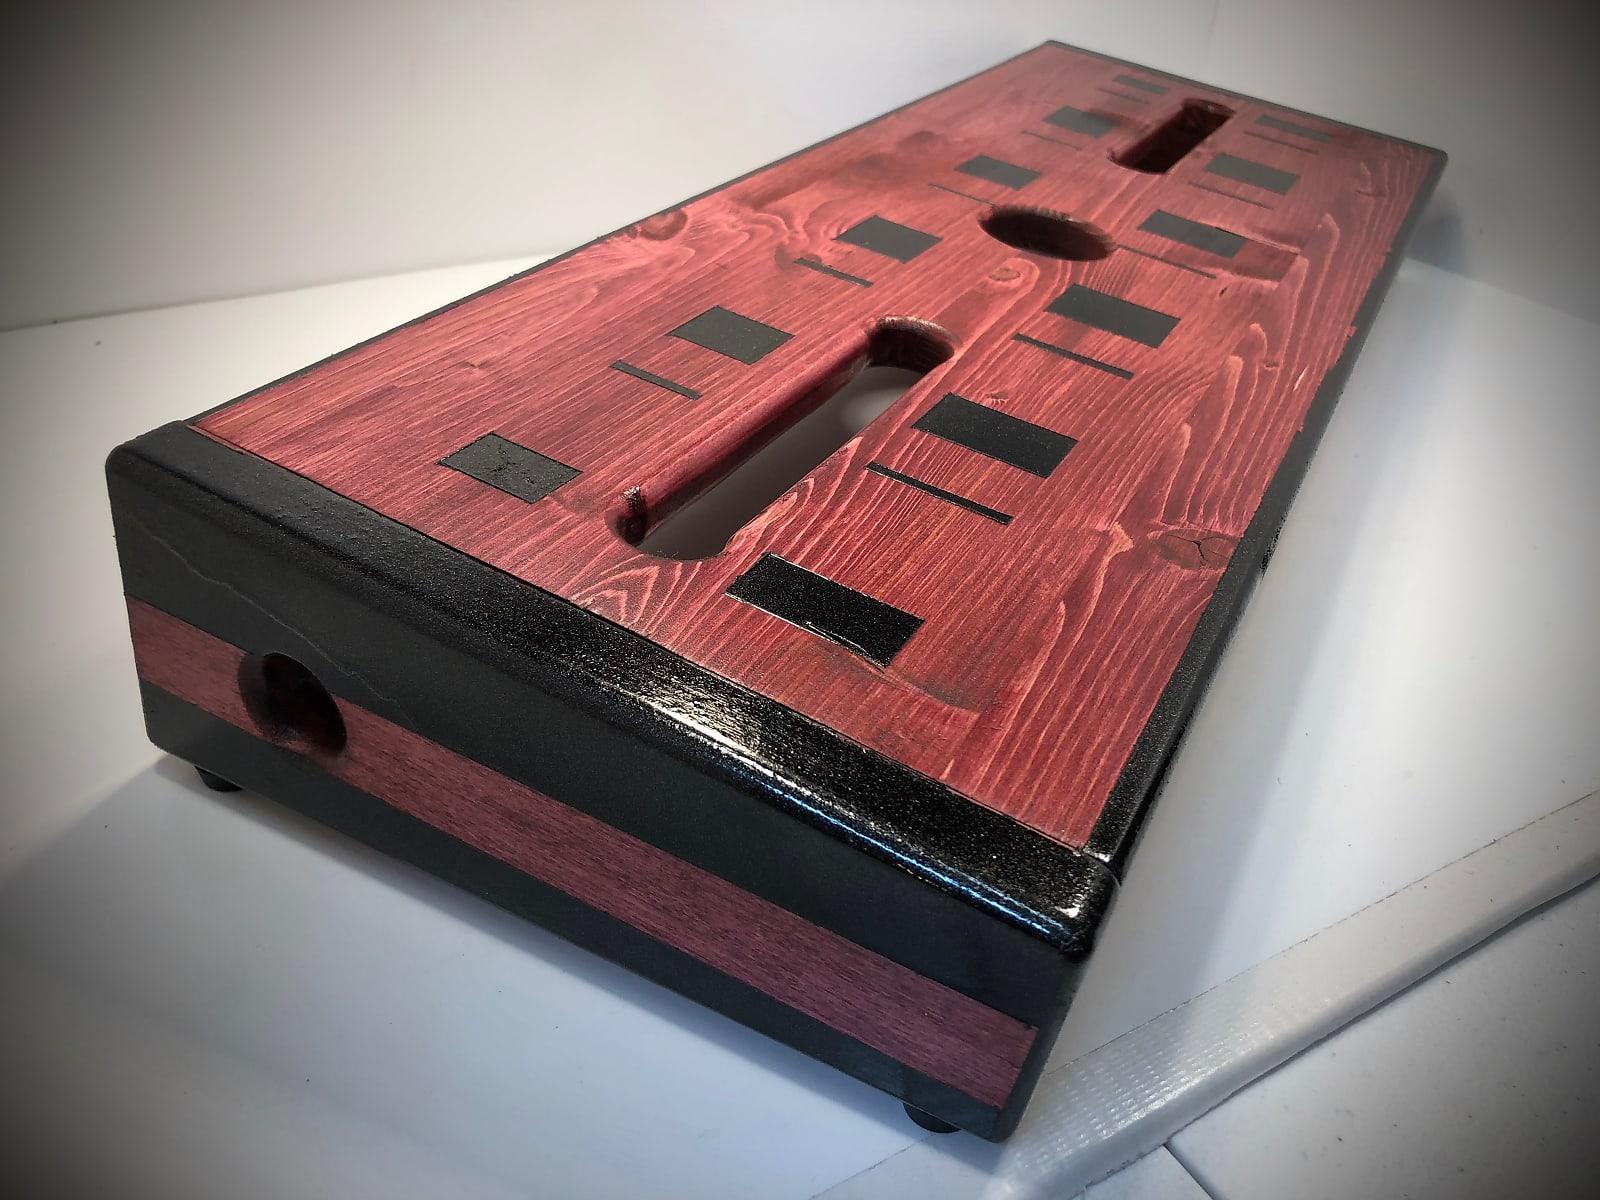 (NEW) Trinity Pedalboard - Cabernet / Black by KYHBPB